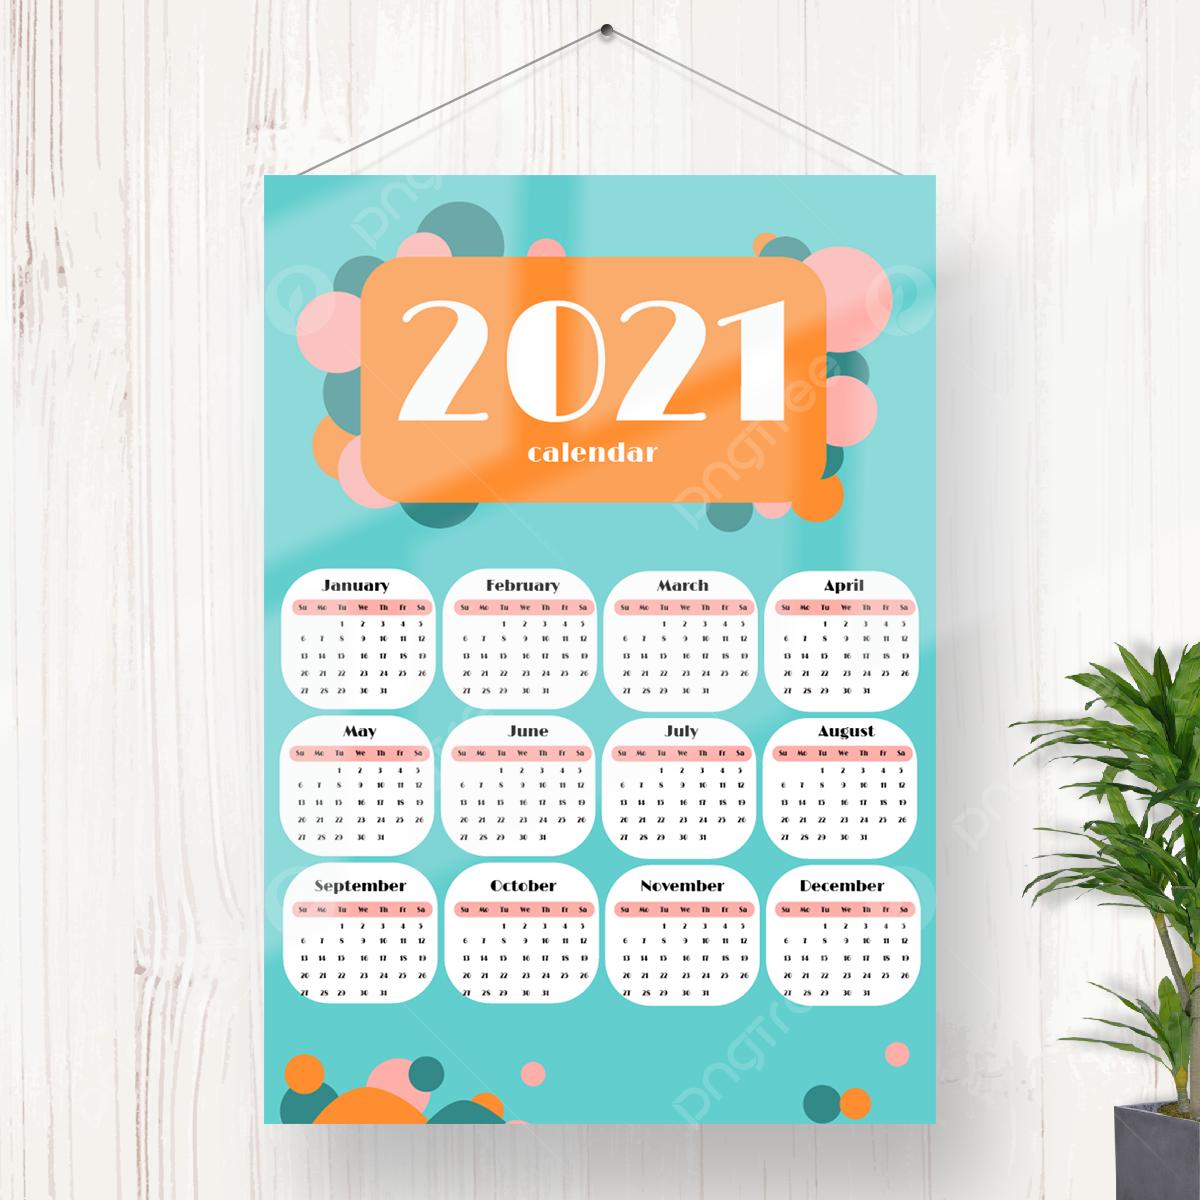 Template Kalender 2021 Aesthetic - Celoteh Bijak